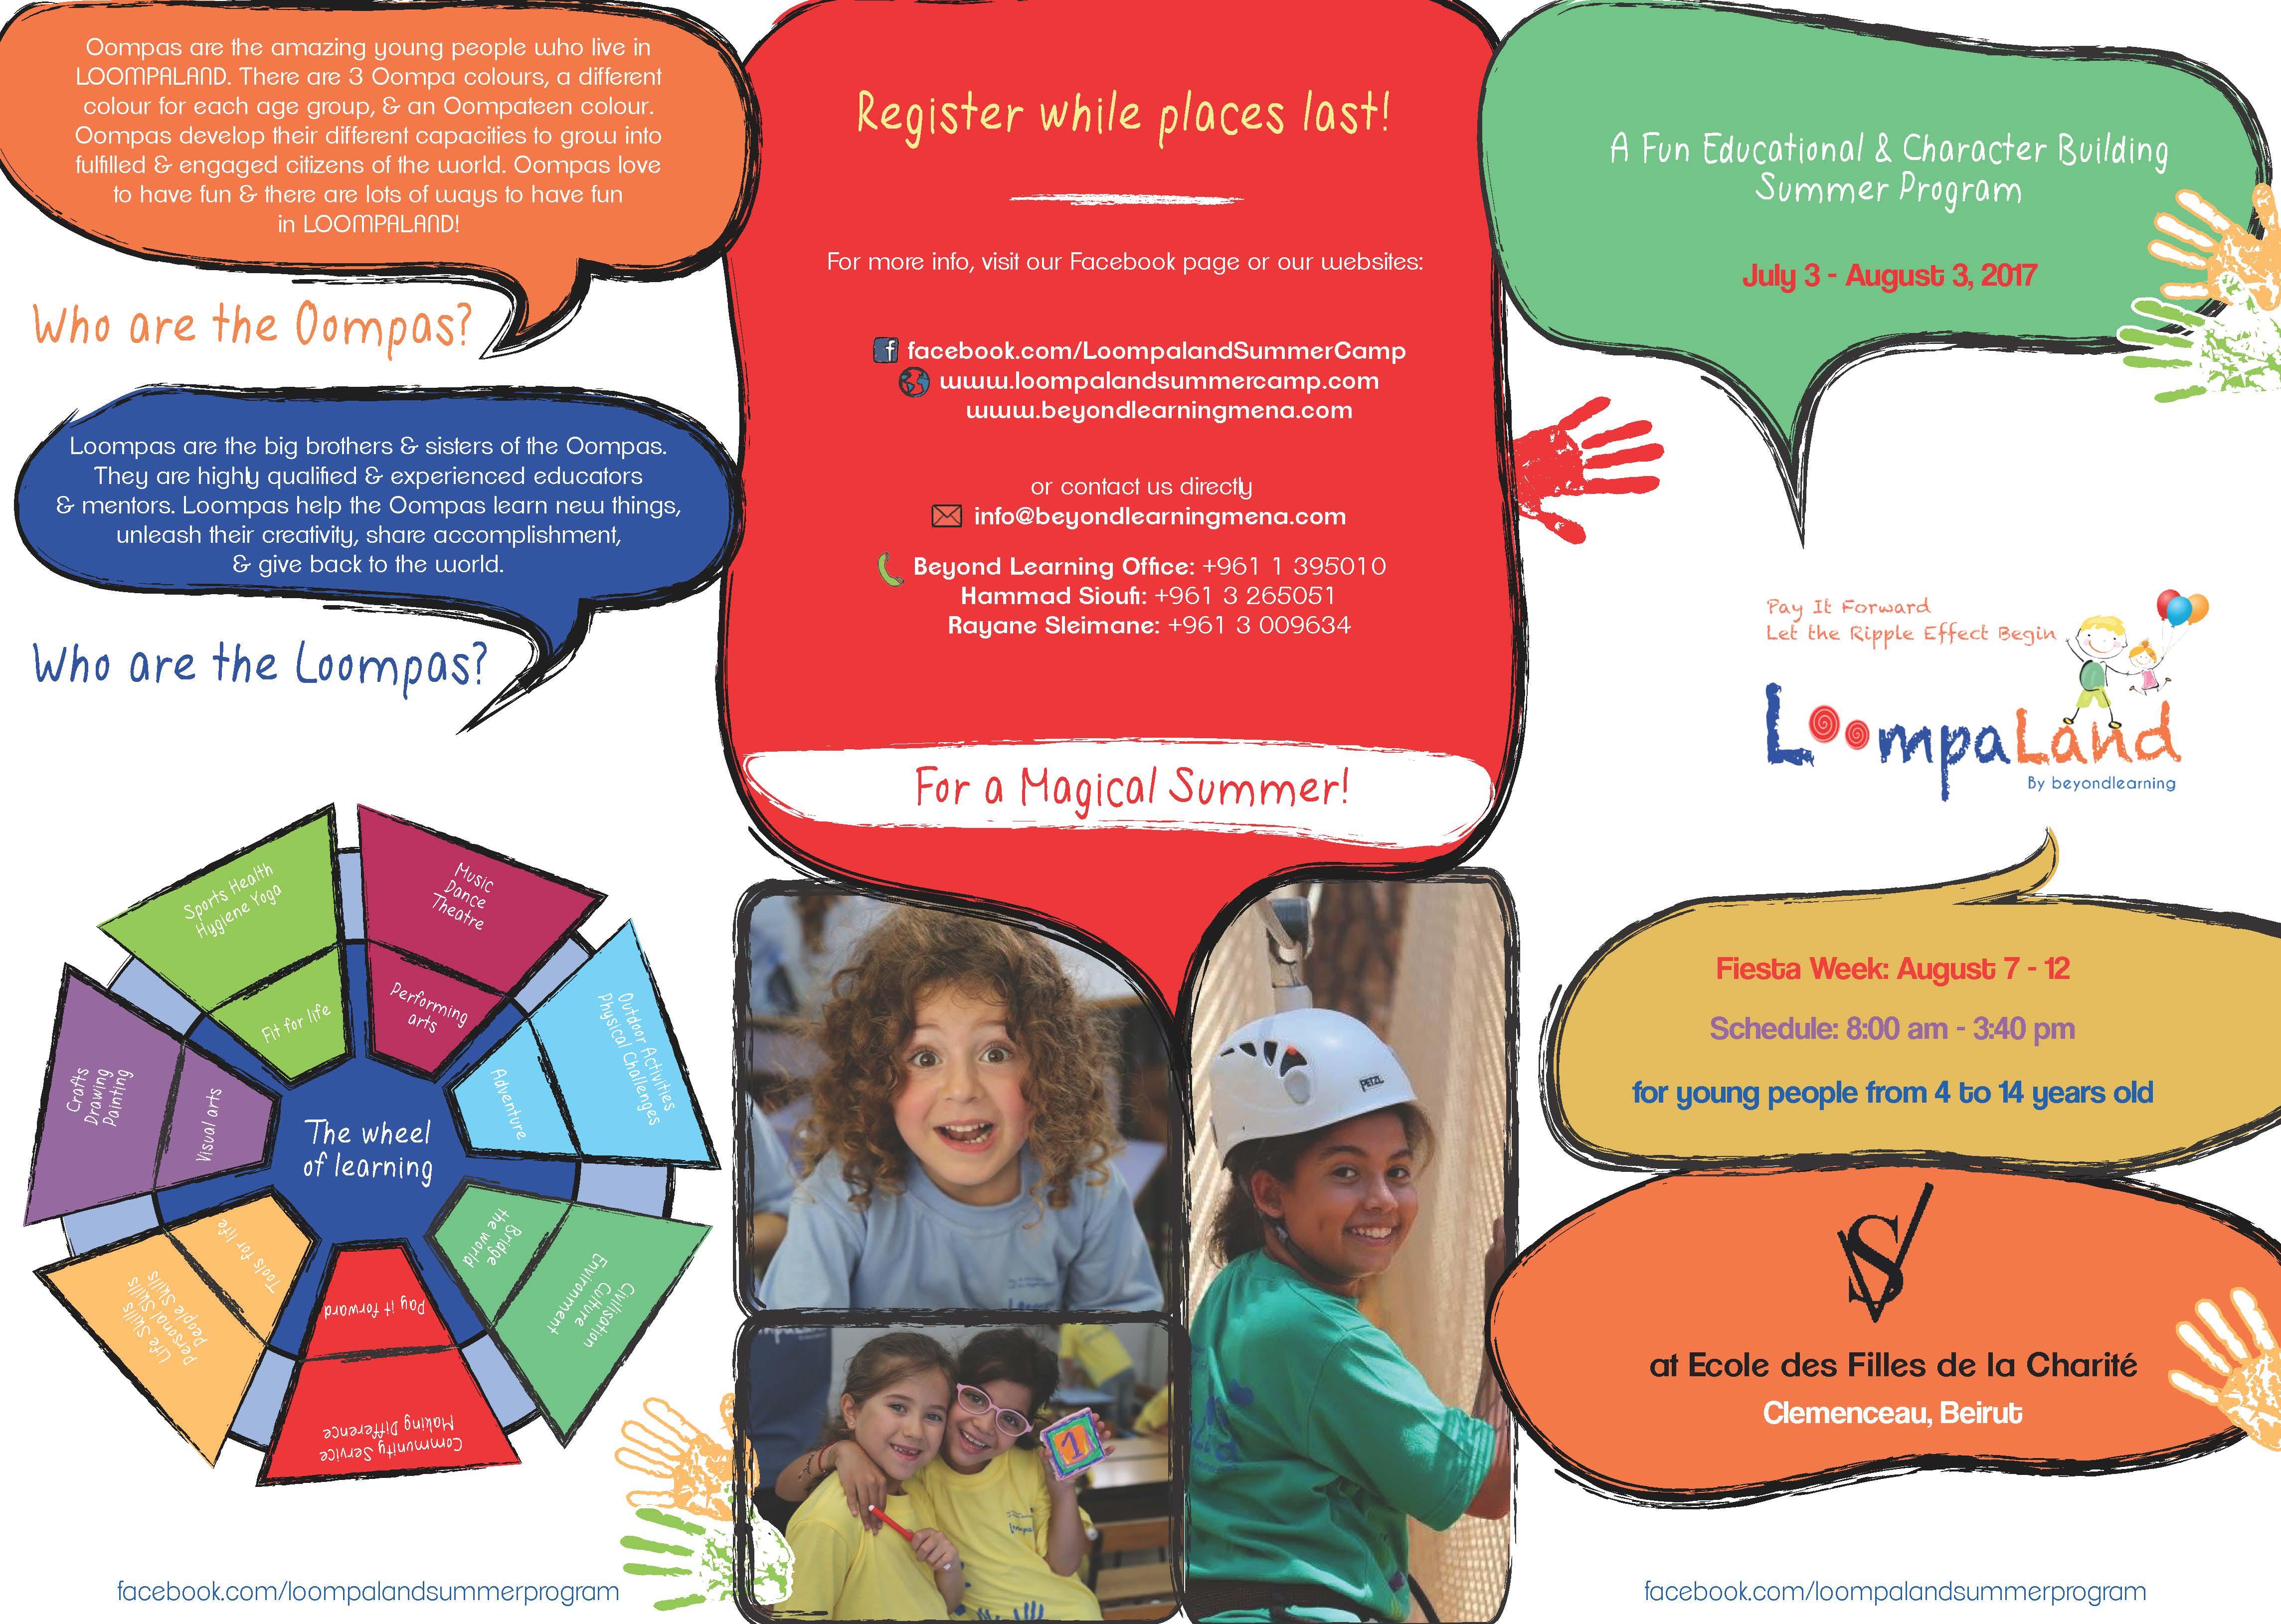 Loompaland 2017 Brochure(1)_Page_1